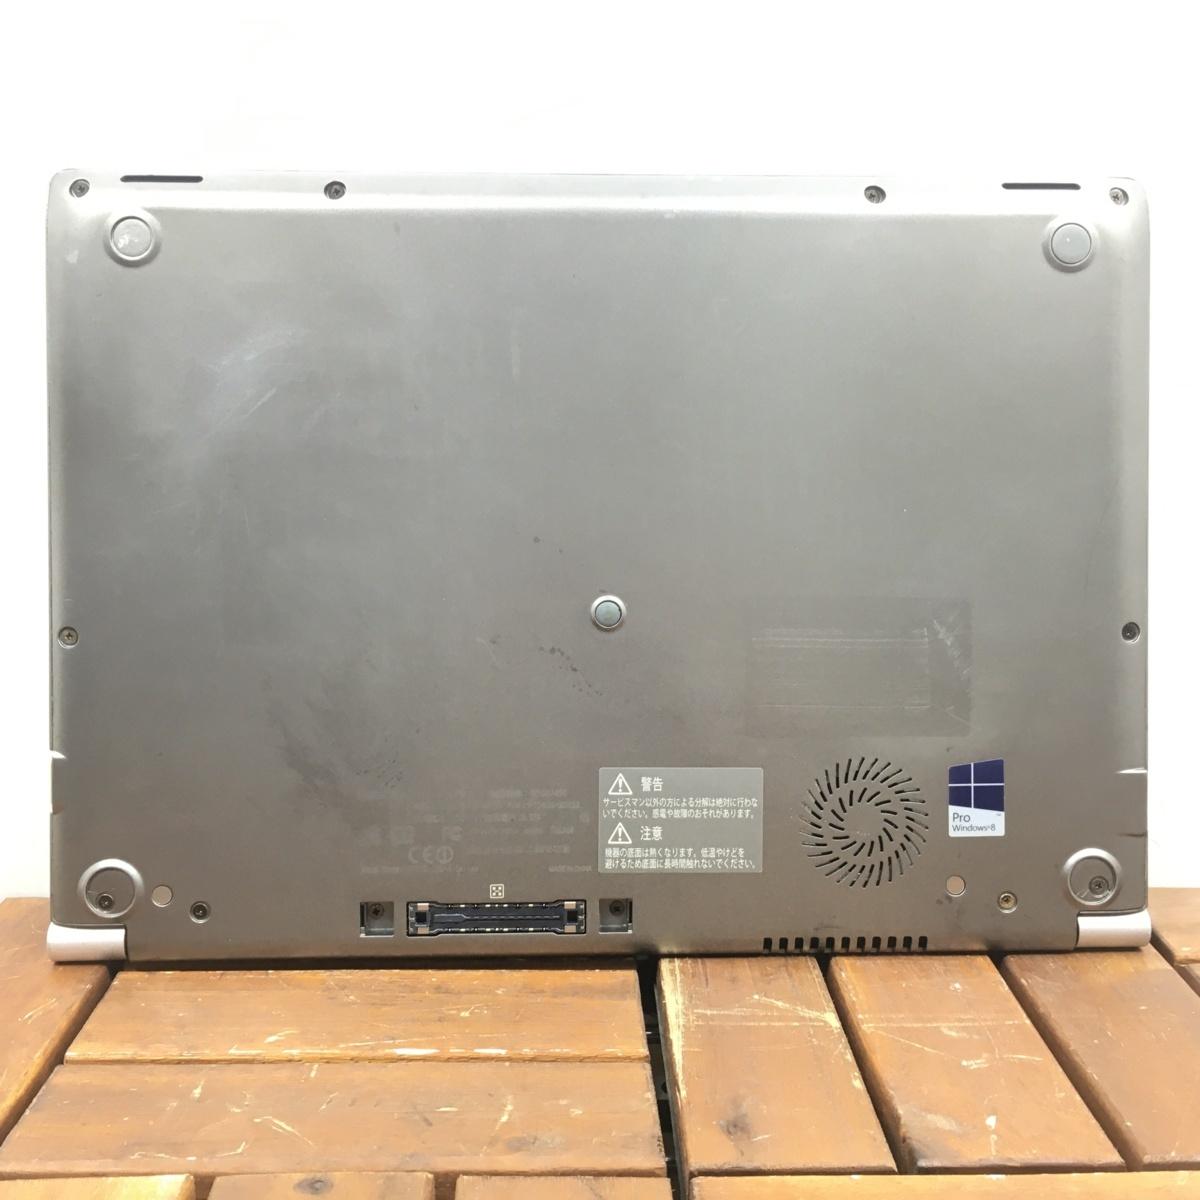 Windows10/office搭載/Webカメラ搭載!ビデオ通話対応【TOSHIBA 東芝/dynabook R634/L】Core i5-4200U/メモリ8GB/SSD128GB_画像6